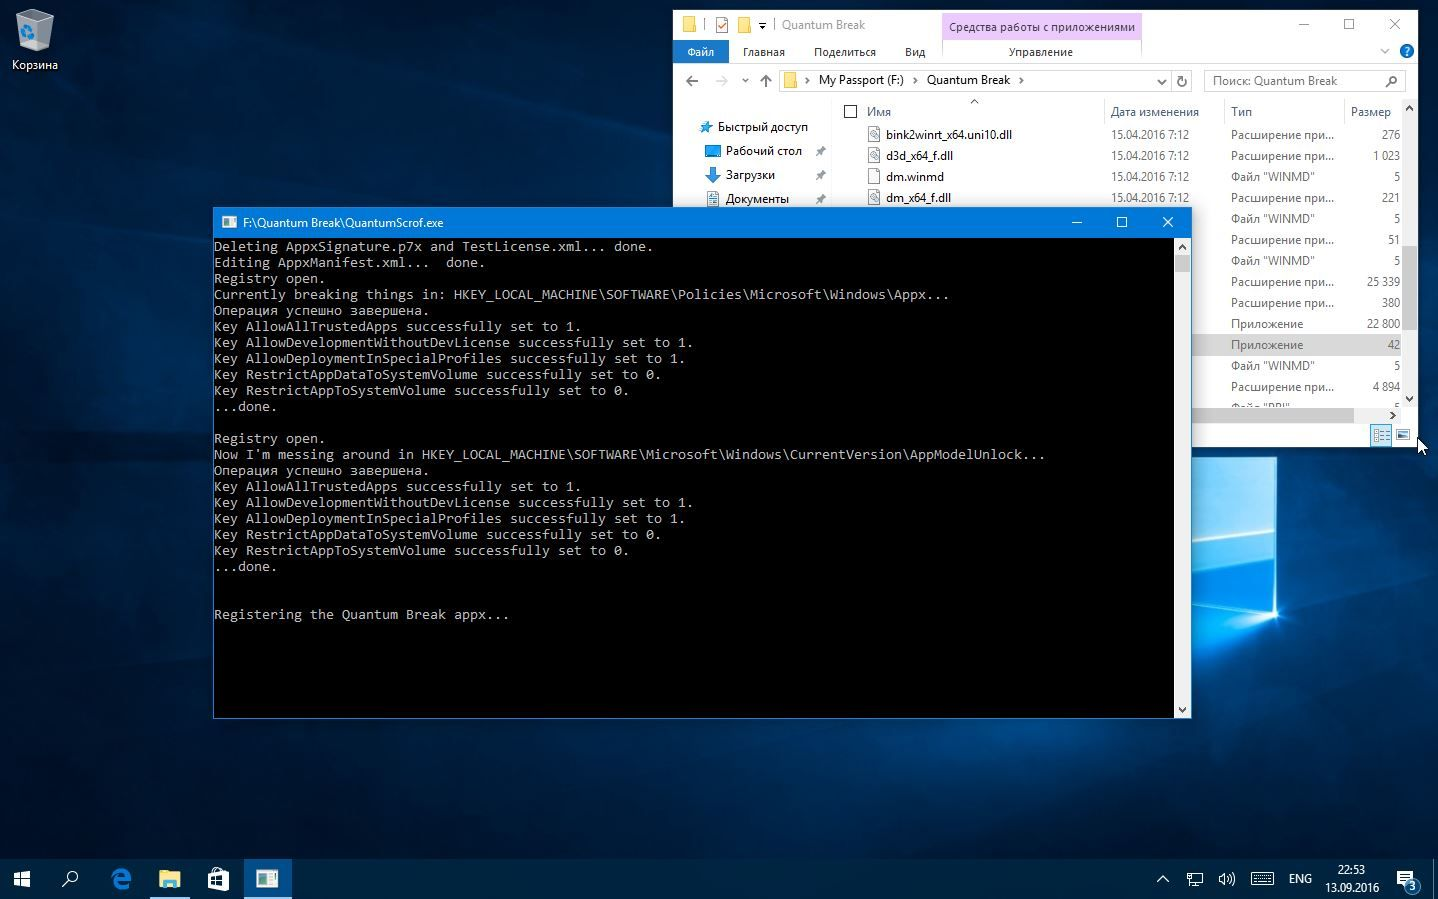 windows 10 pro super lite 32 bits torrent